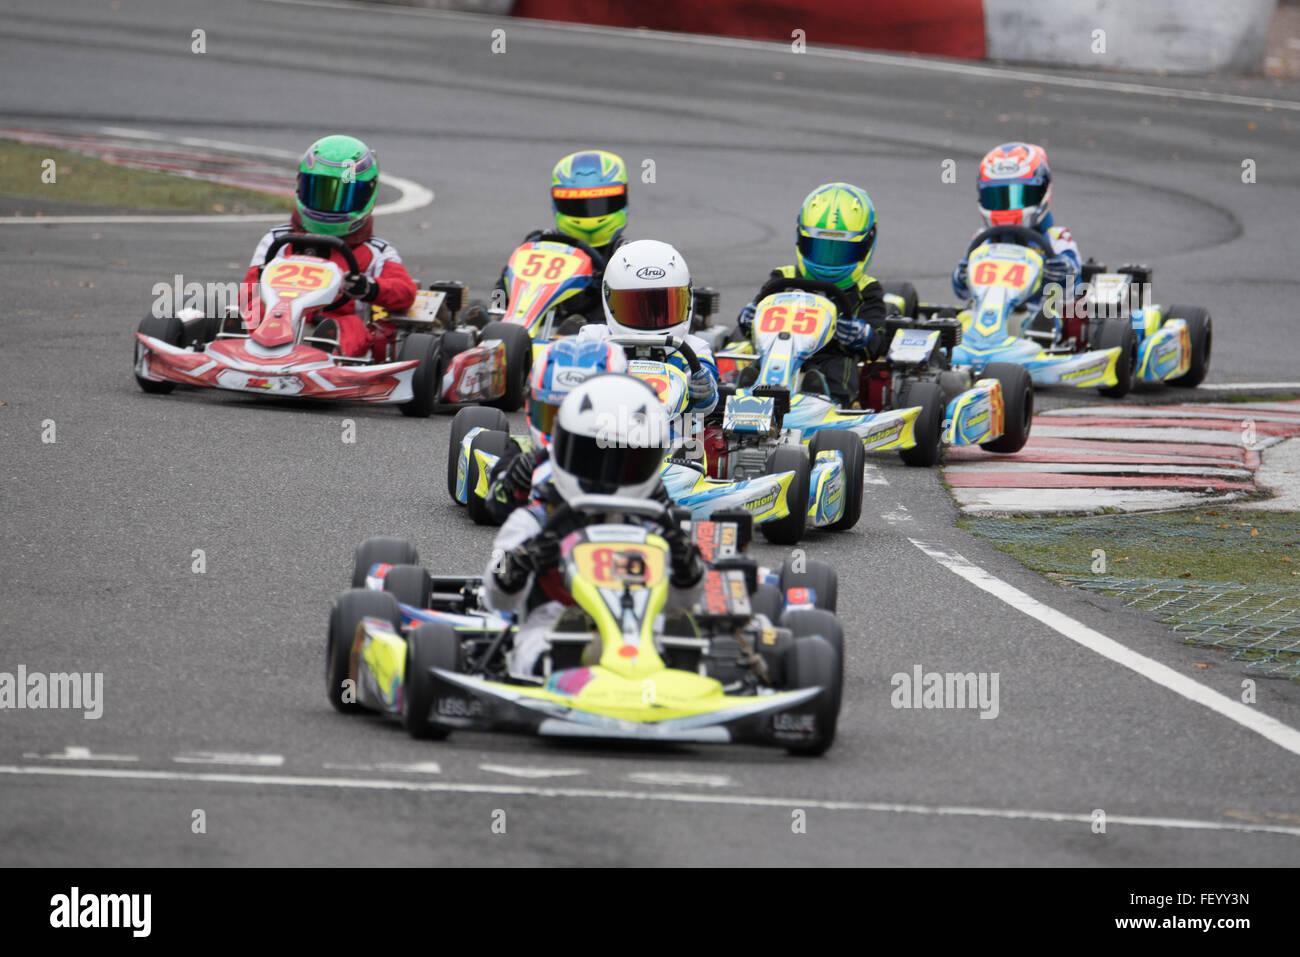 Karting race kids Stock Photo: 95271001 - Alamy